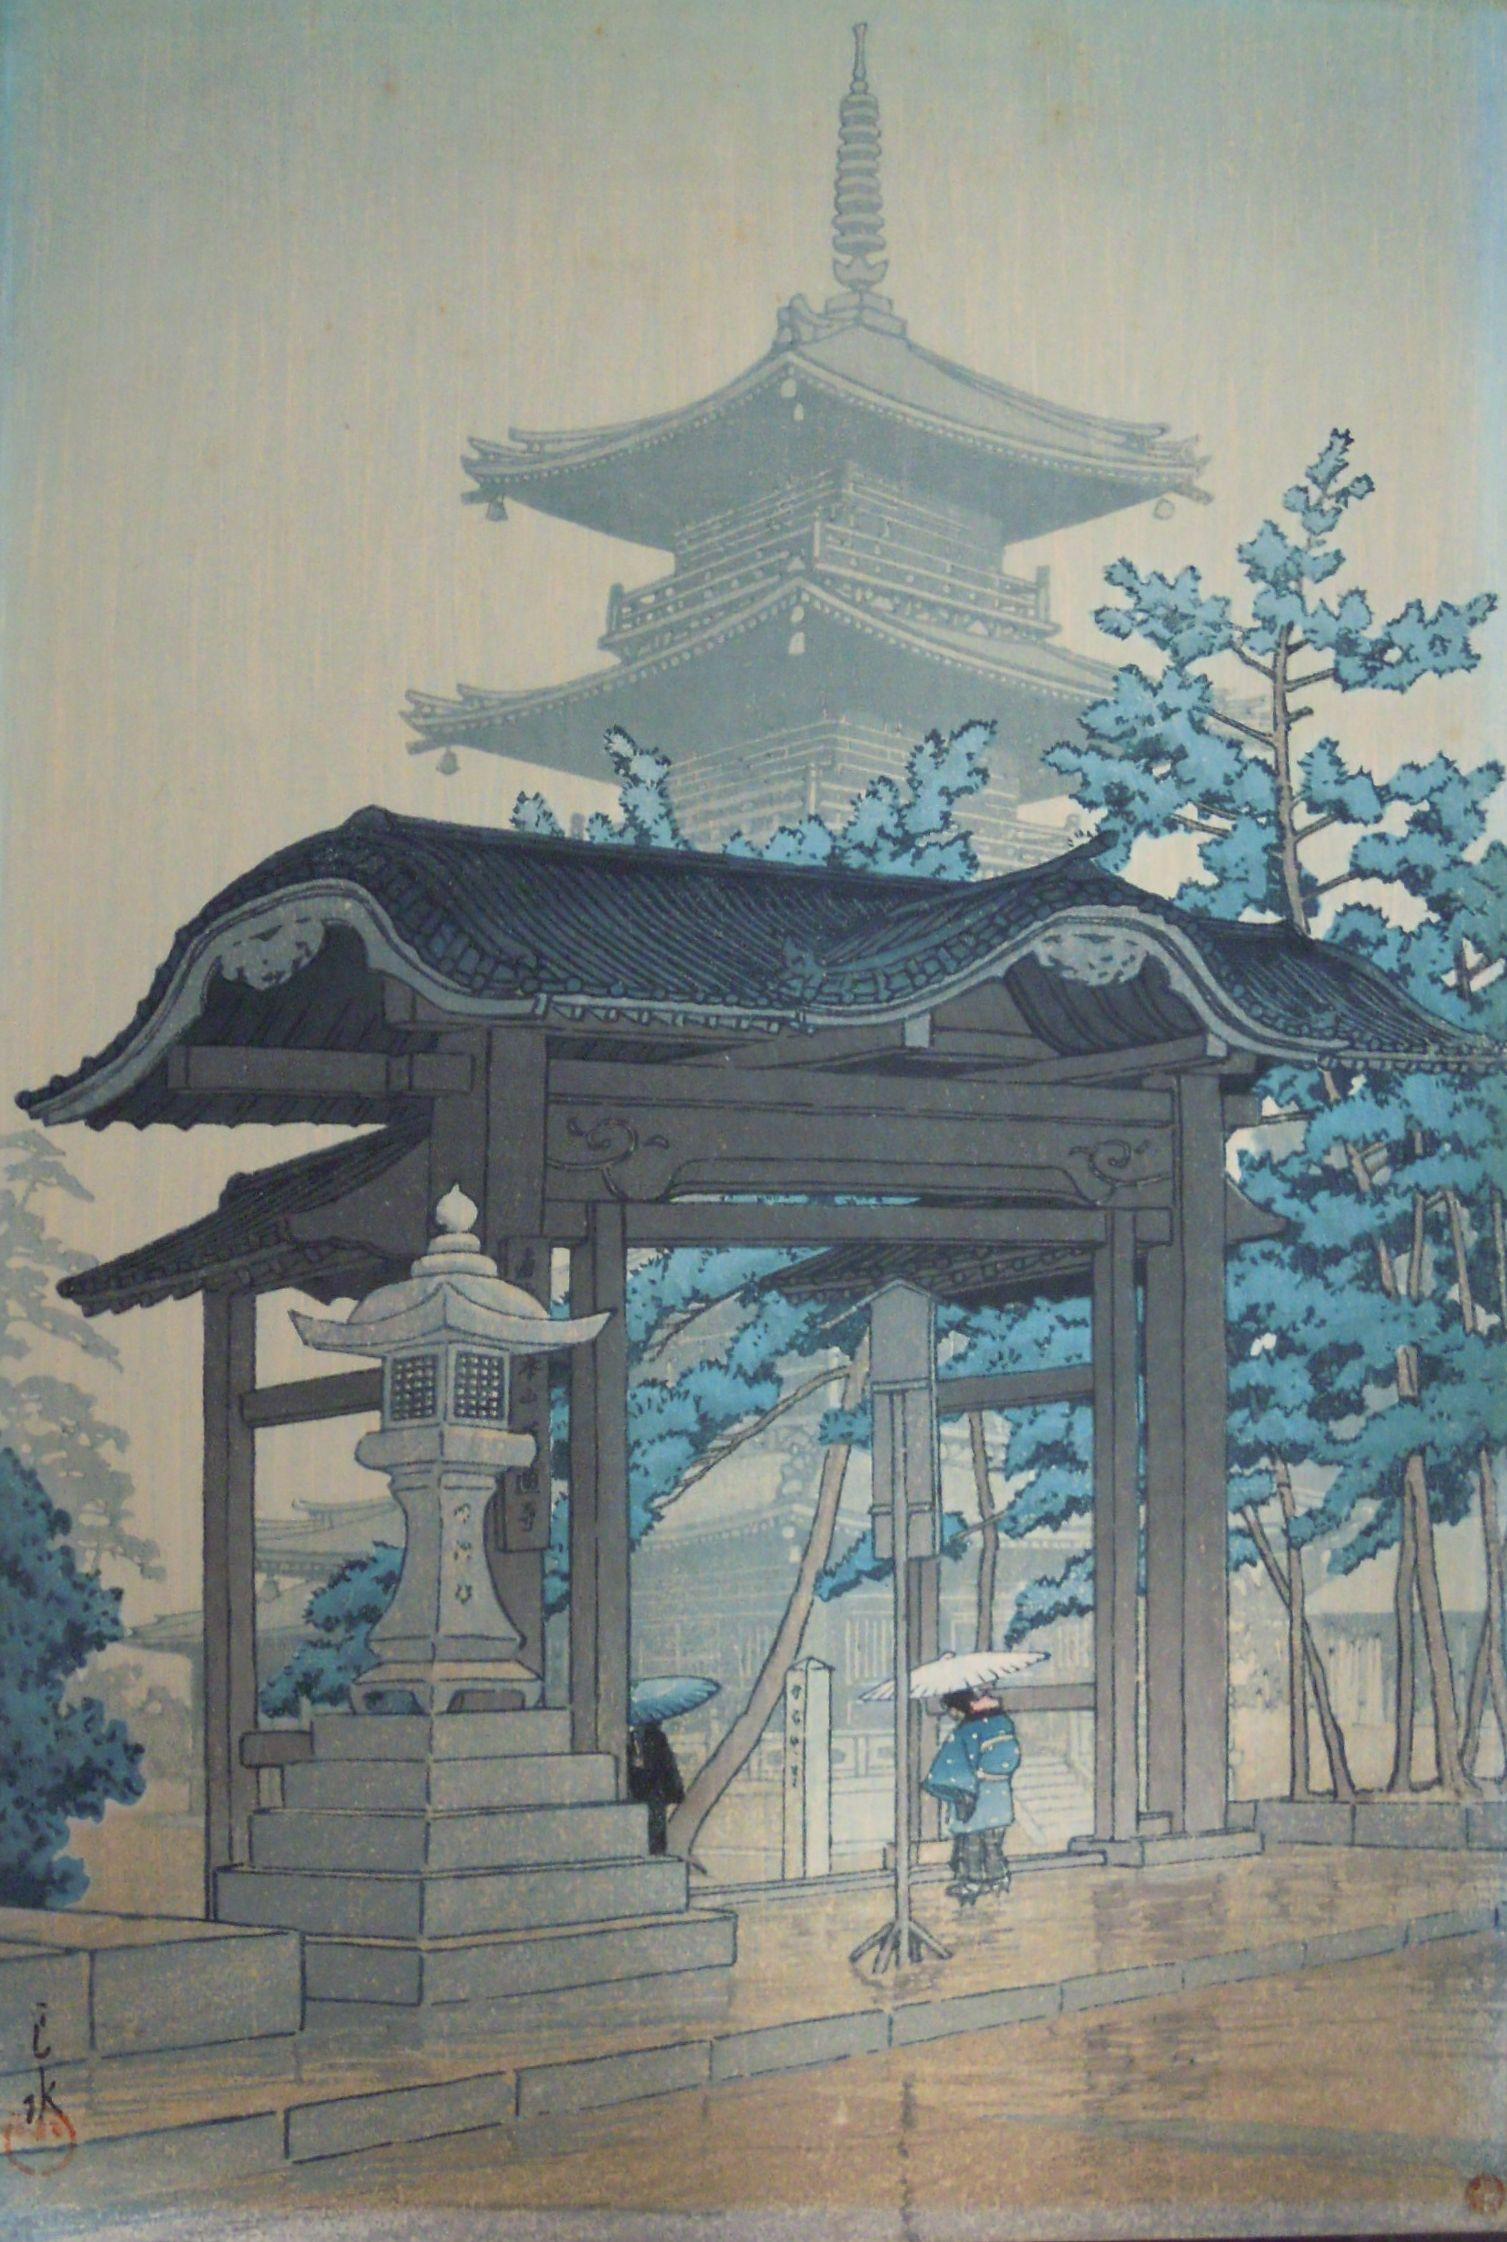 Zentsuji Temple in Rain KAWASE HASUI Japanese Art Woodblock Print Shin Hanga